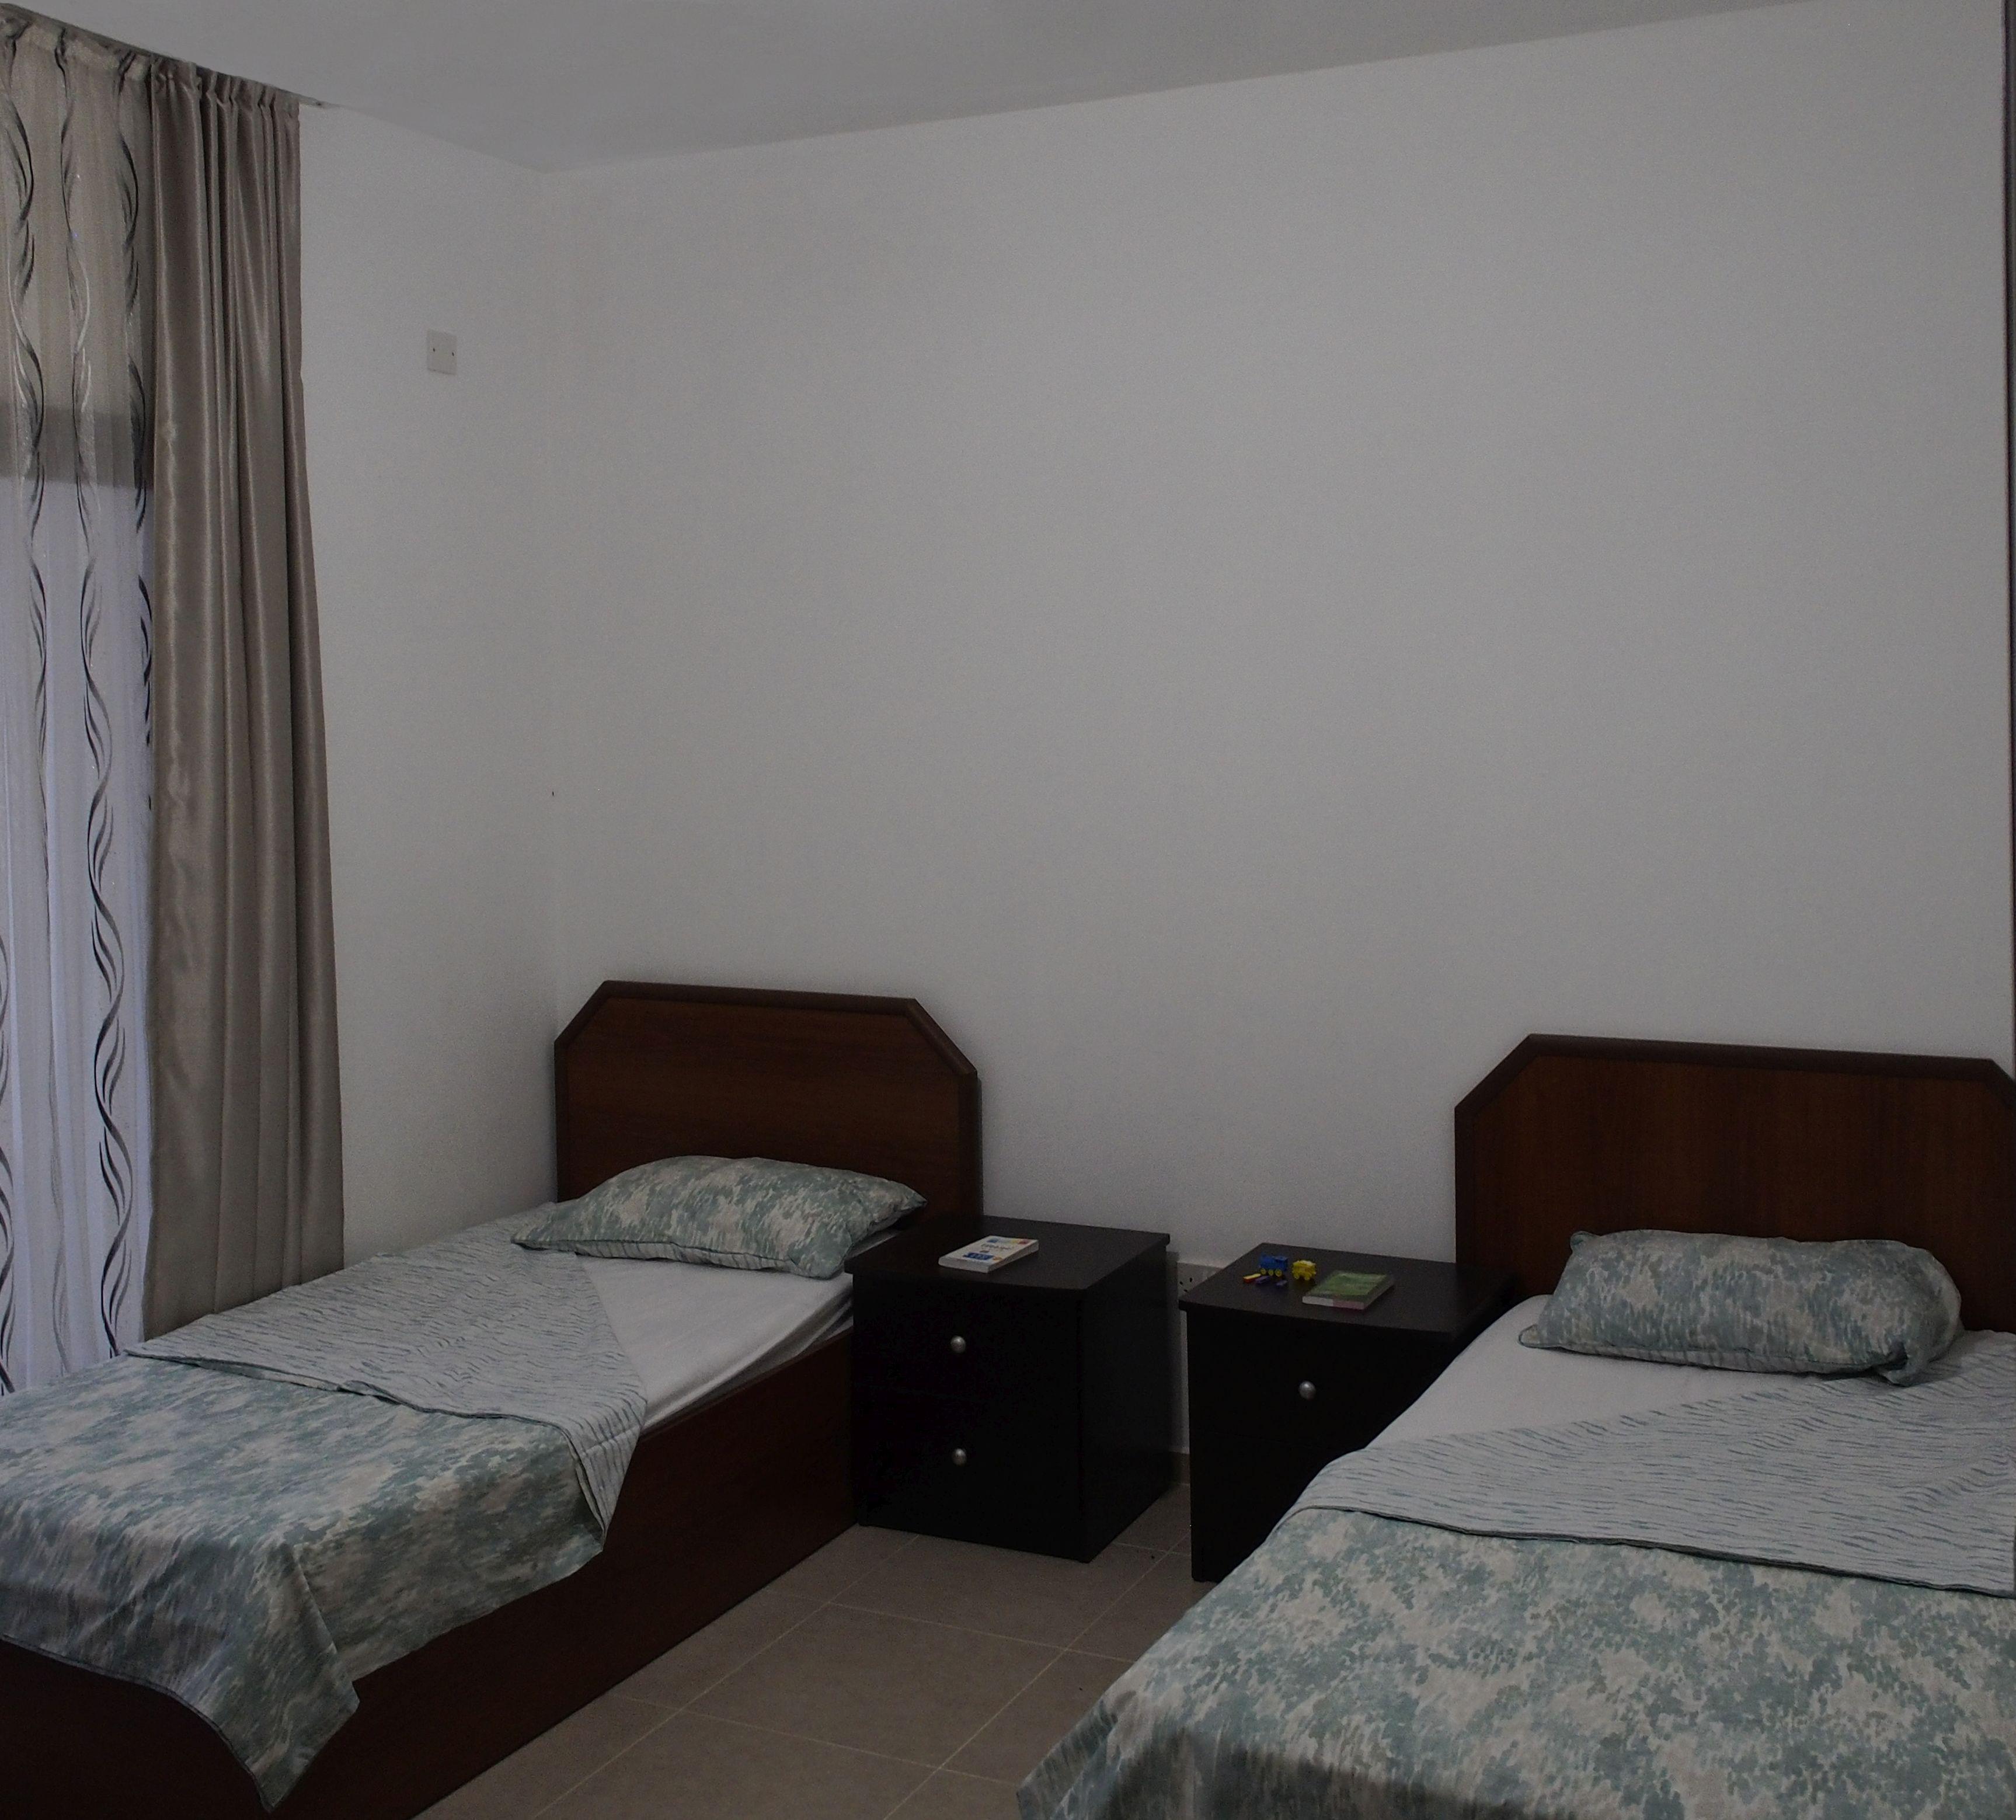 Senaparts.com SenAparts student accommodation Lefke Cyprus